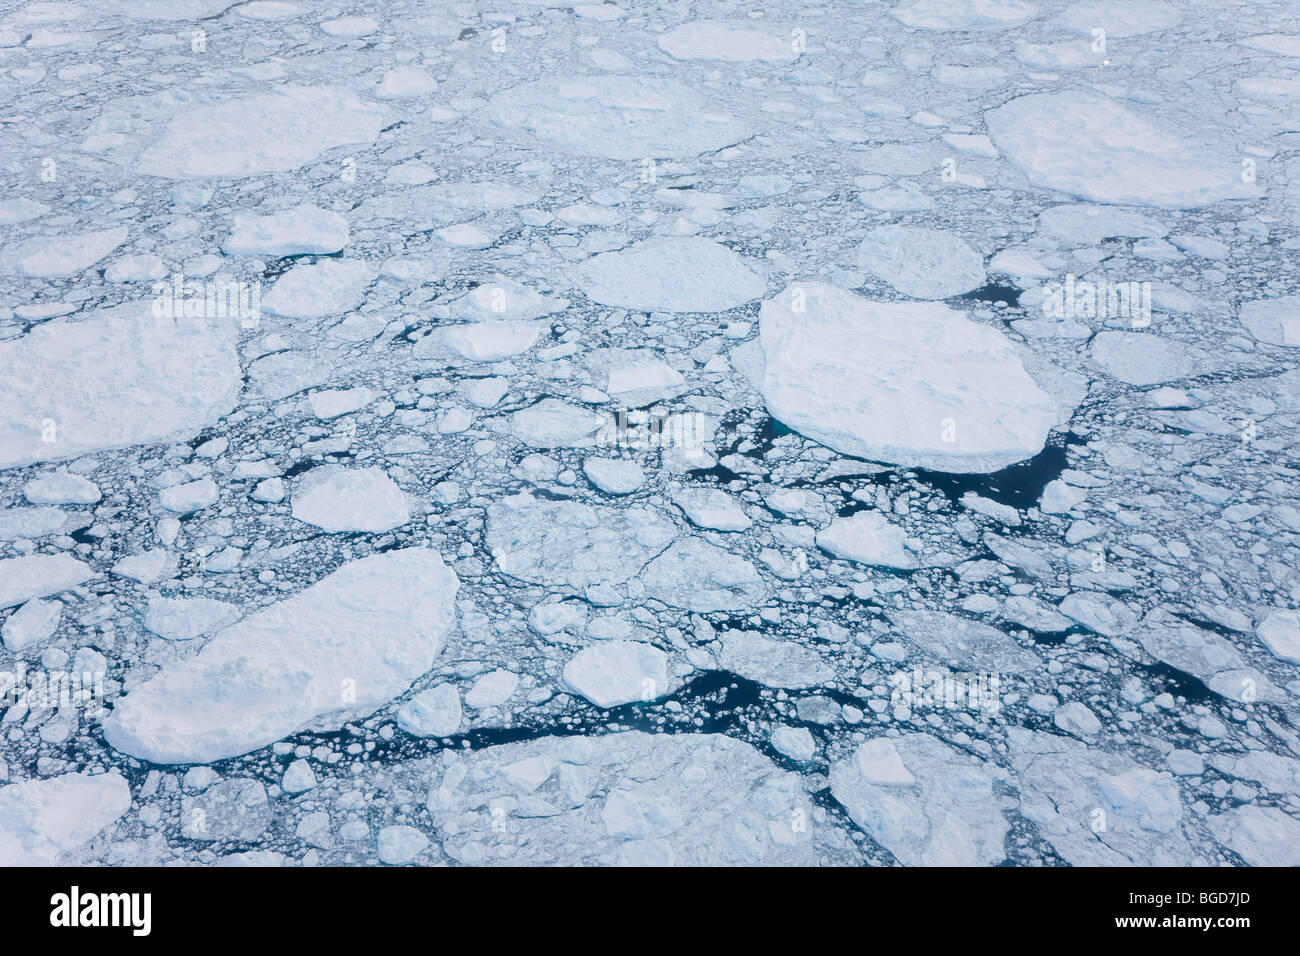 Eyriel vue de la glace de mer, Kulusuk, E. Greenland Photo Stock